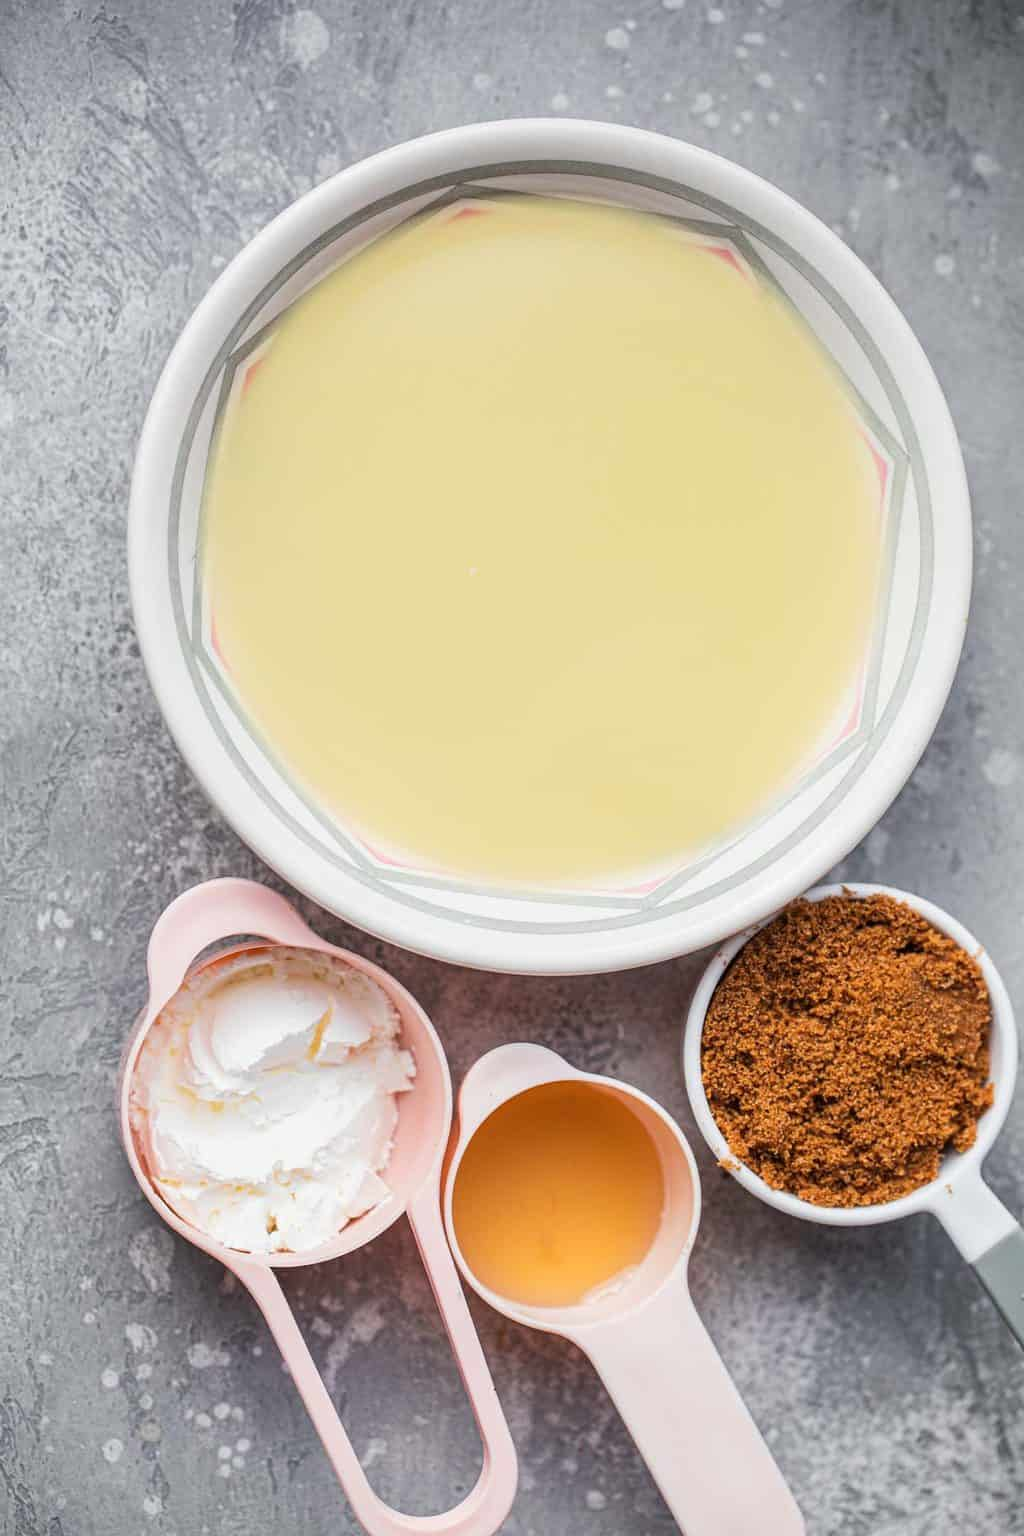 Vegan cream filling ingredients